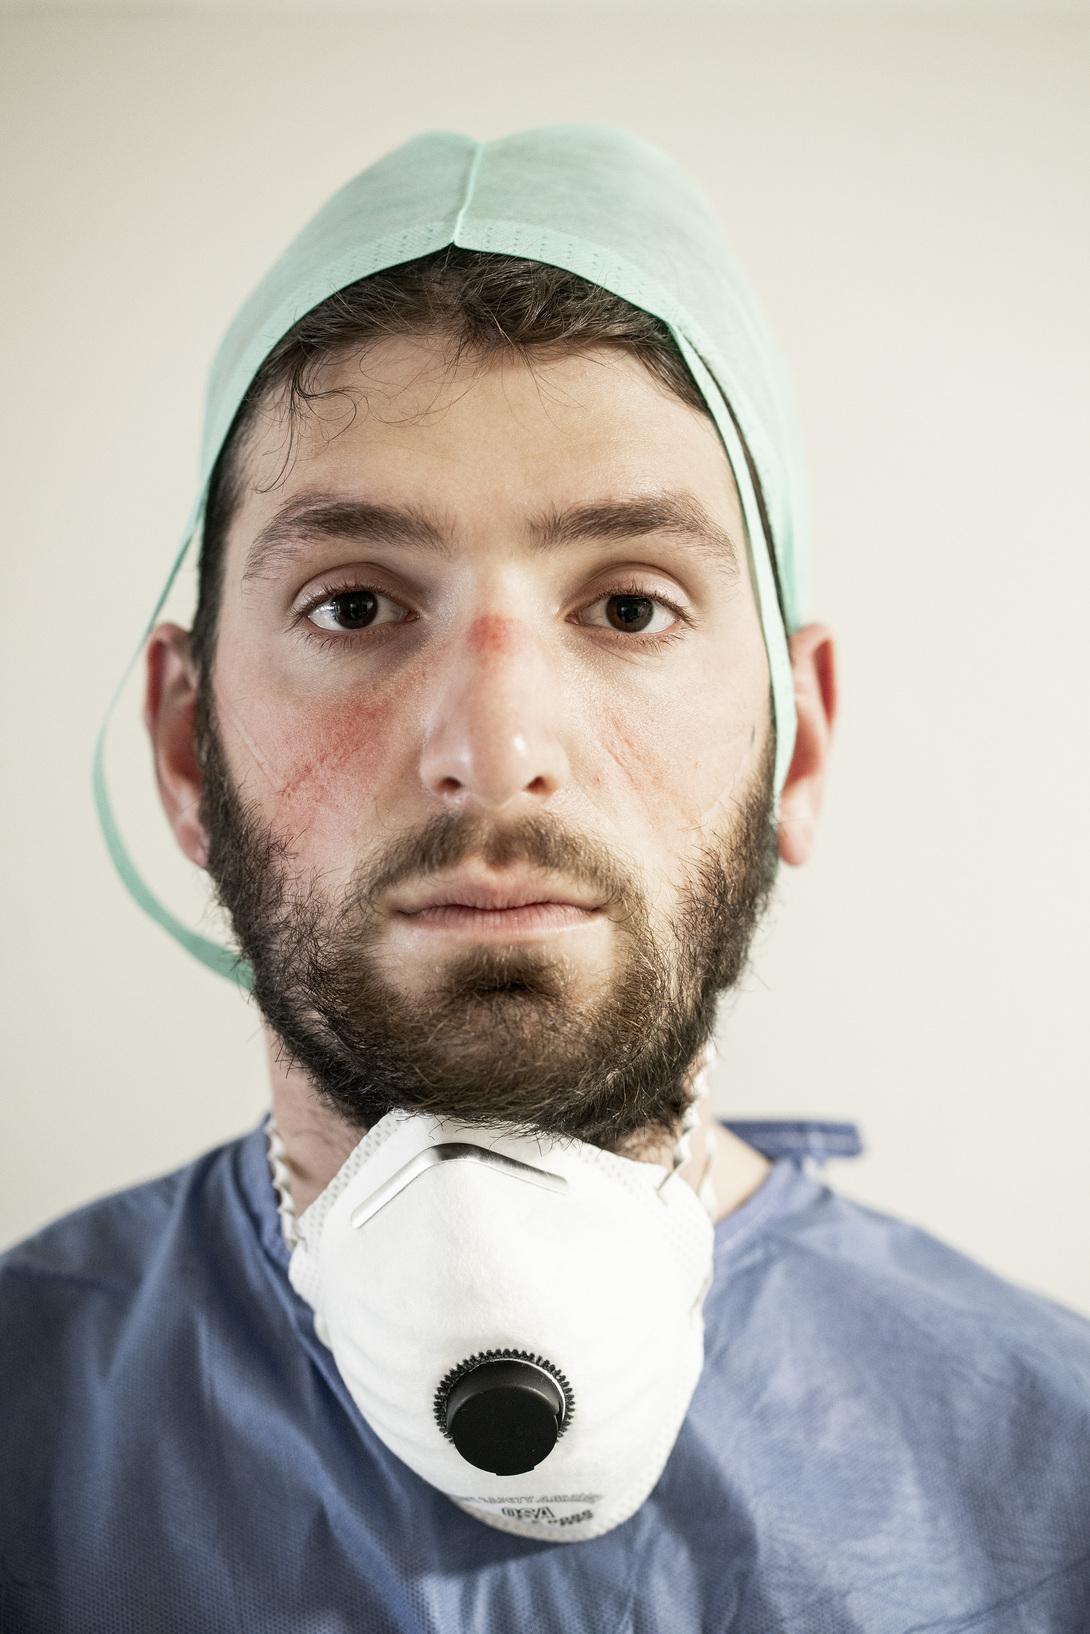 Alberto Giuliani Reportage dall'ospedale di Pesaro Federico Paolin, Intensive Care and anaesthetist specializing doctor